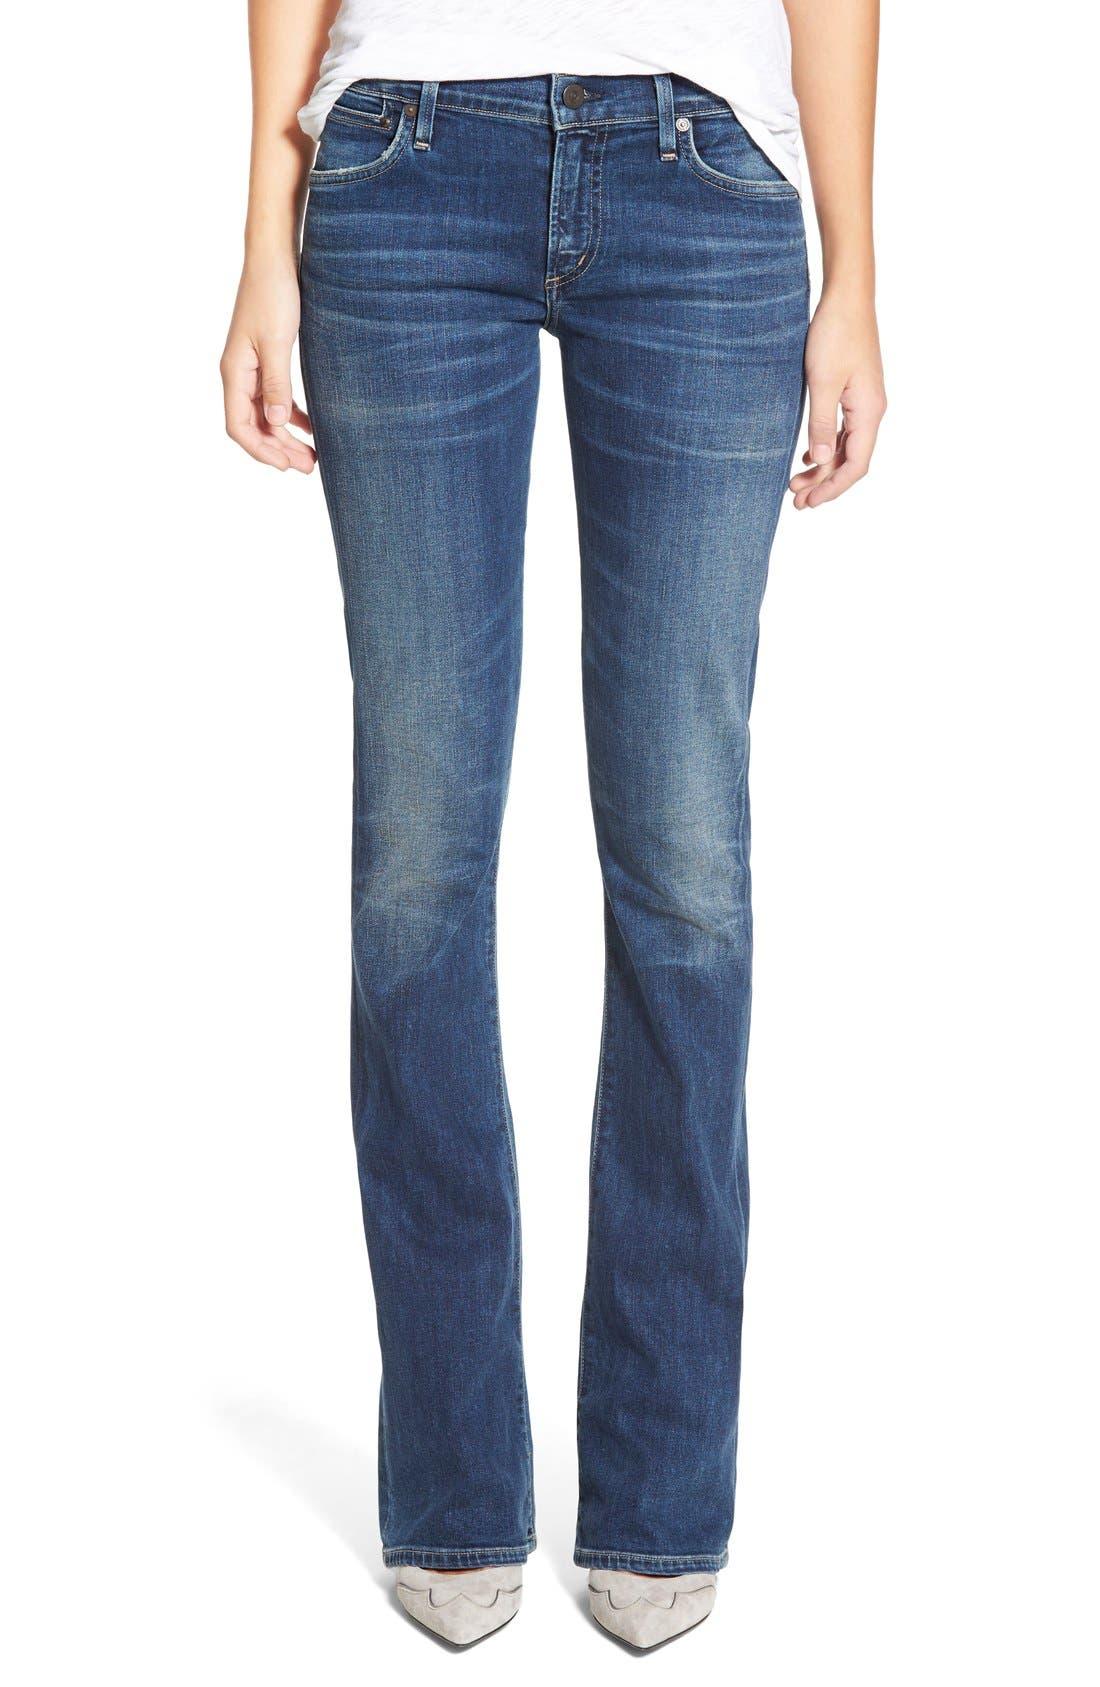 'Emannuelle' Slim BootcutJeans,                             Main thumbnail 1, color,                             MODERN LOVE